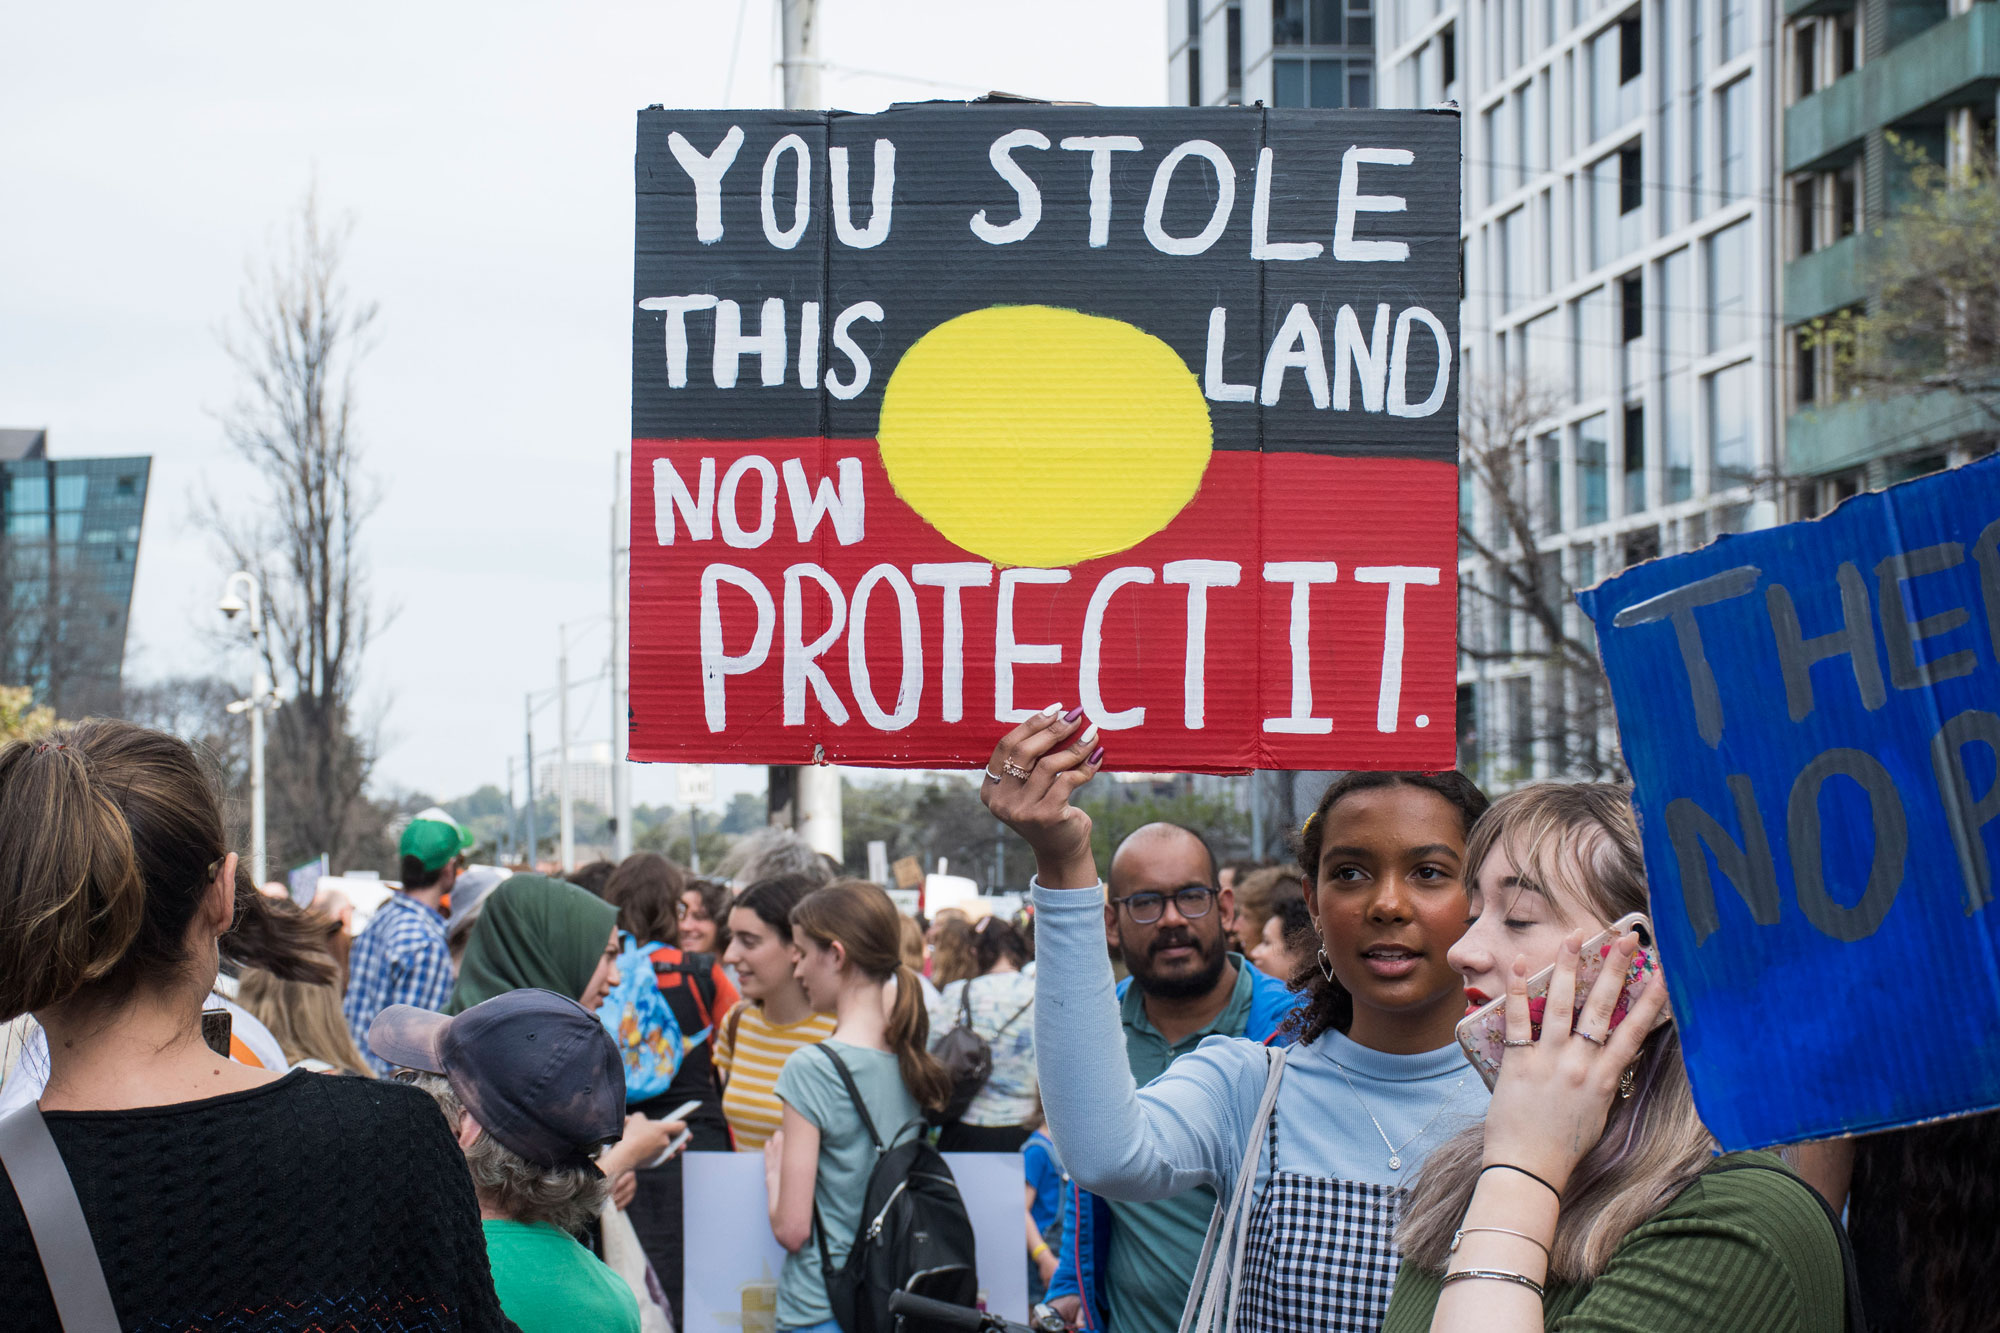 Natasha says she is doing the strike for the future of this land, Australia and the children. Photo: Chenxi Gui